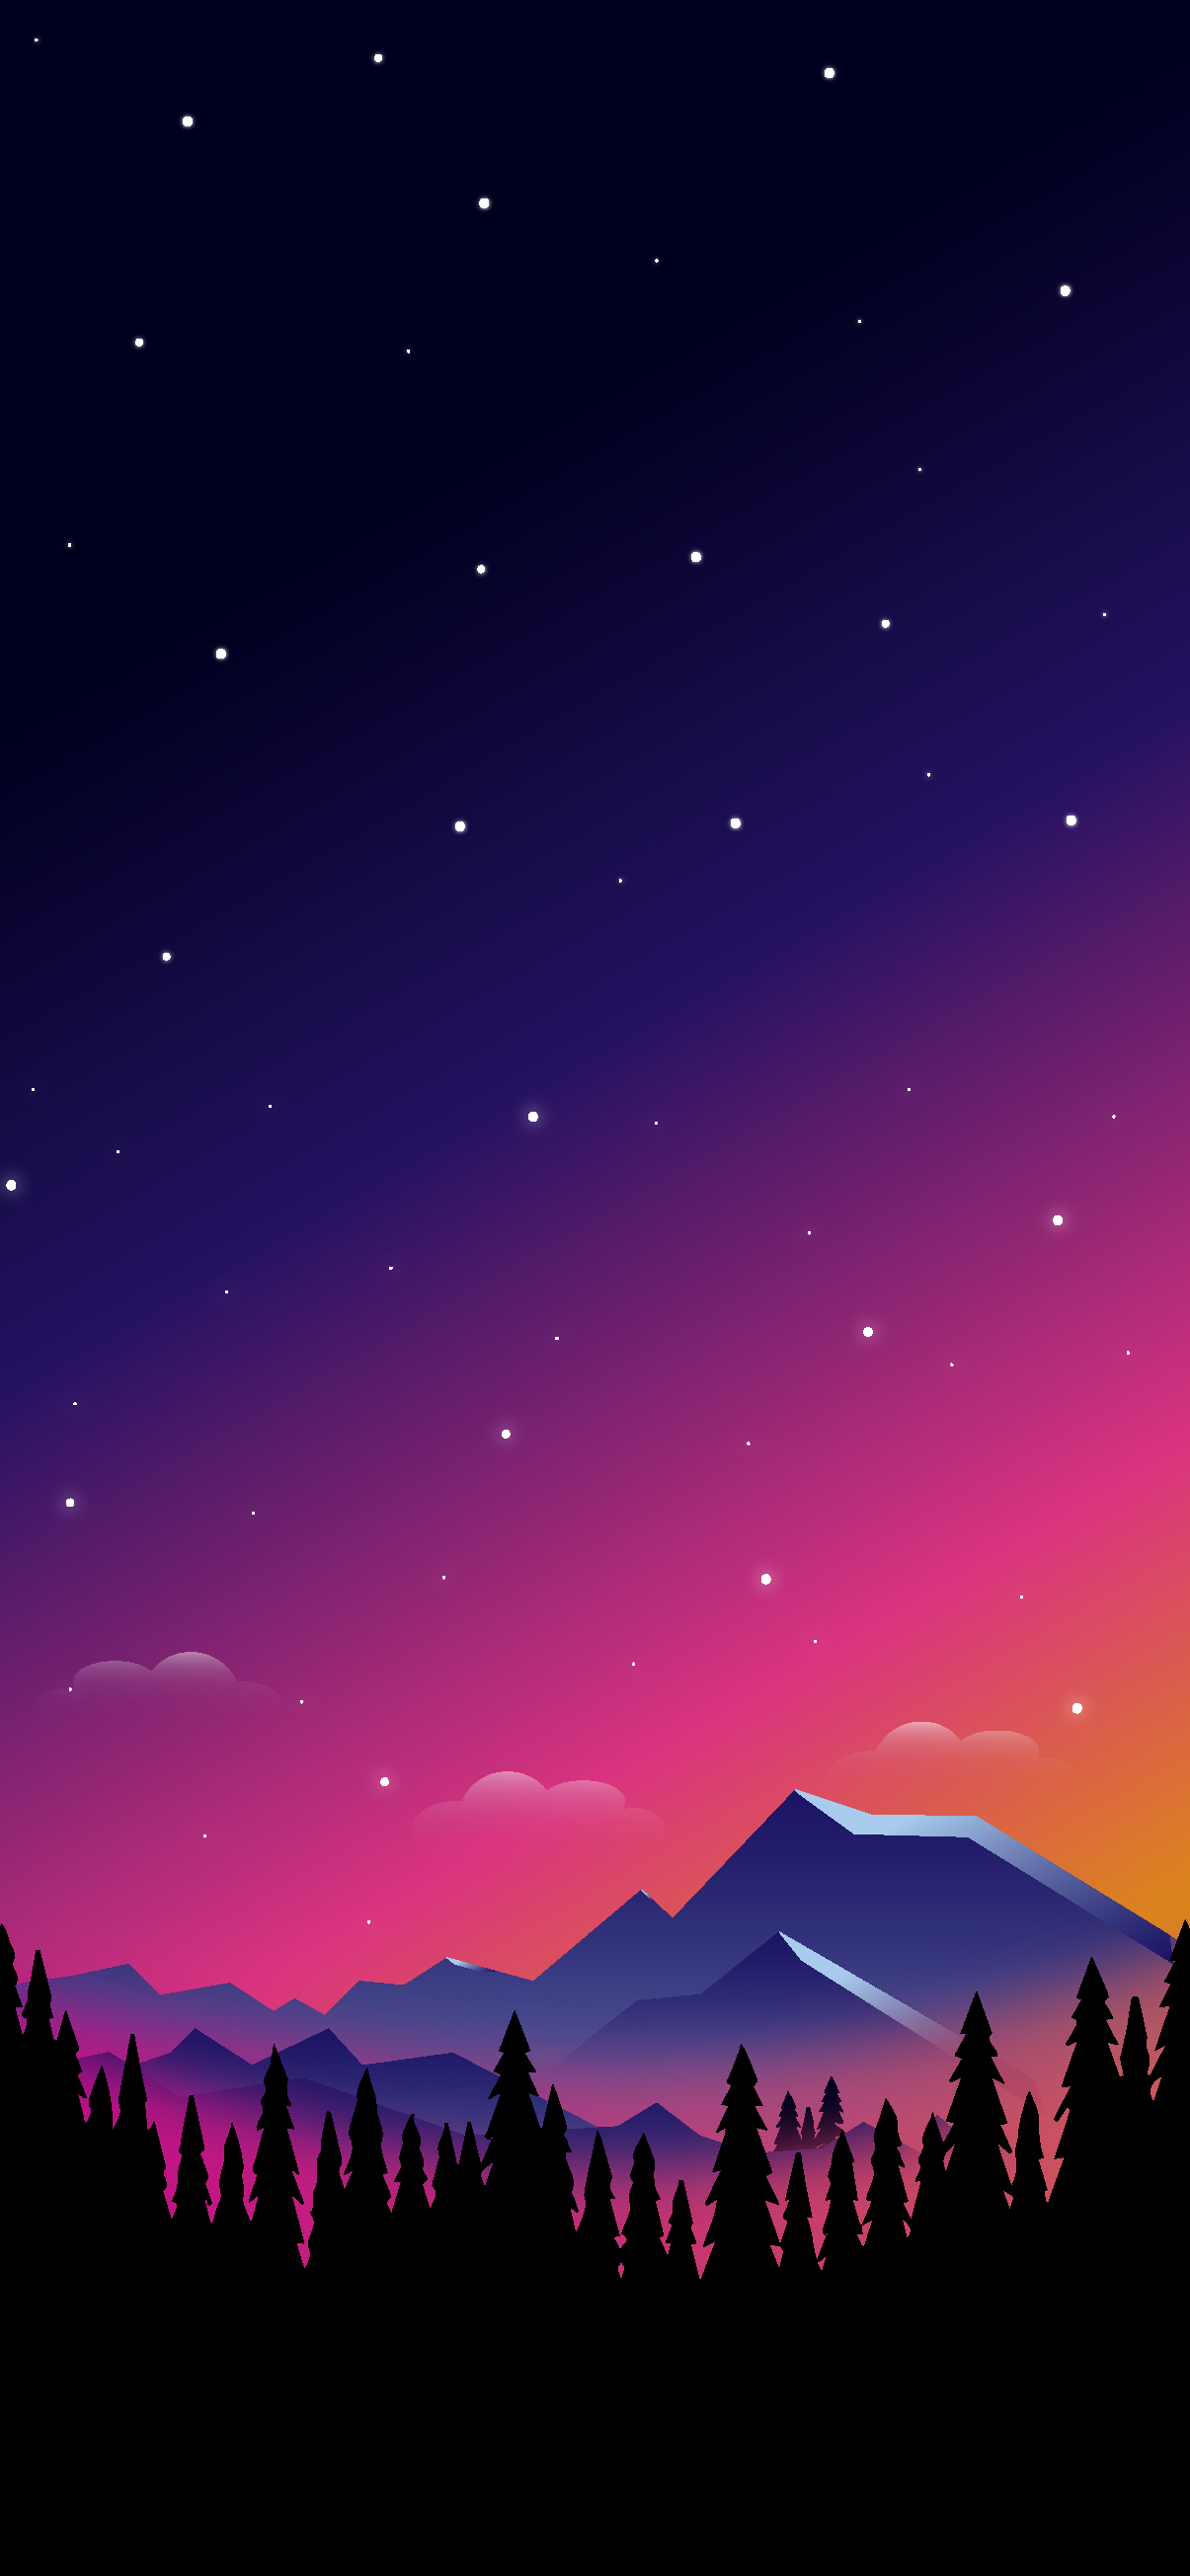 Wallpaper iphone landscape HD 1